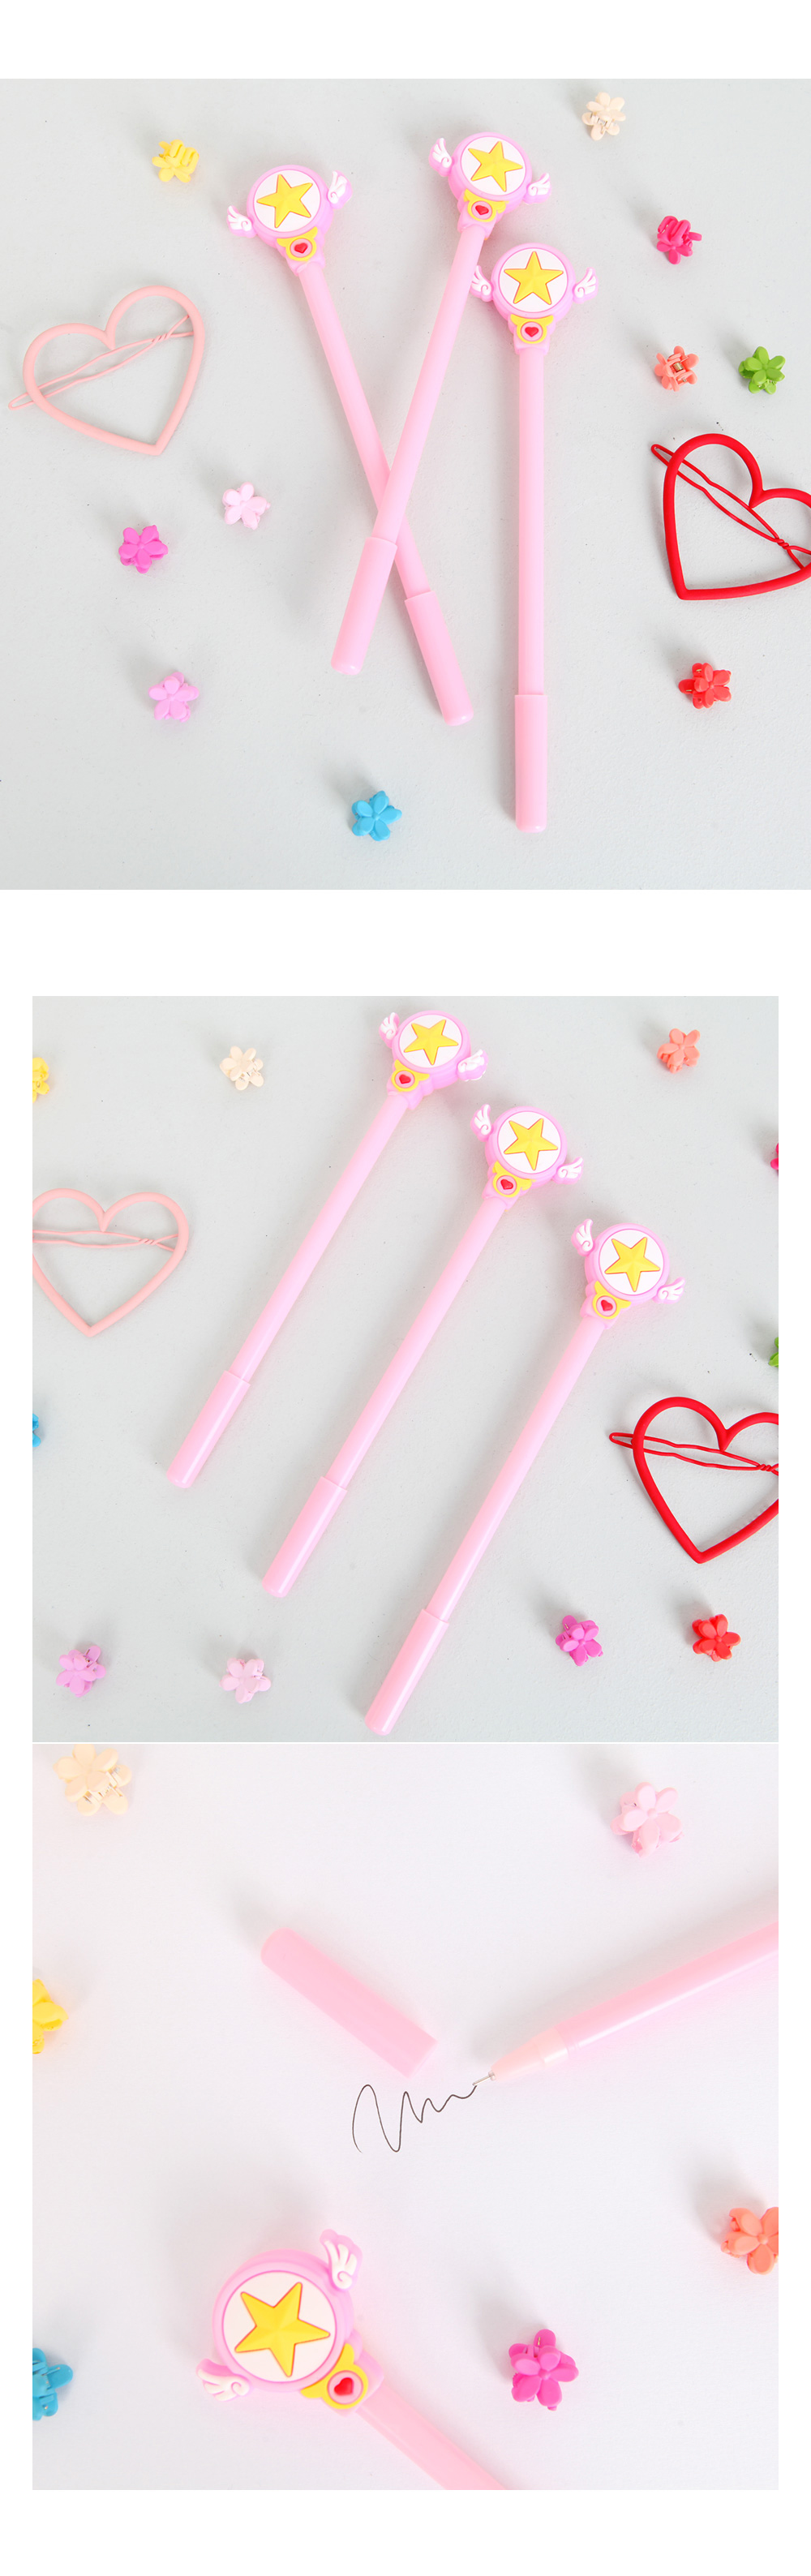 Shiny Star Ballpoint Pen